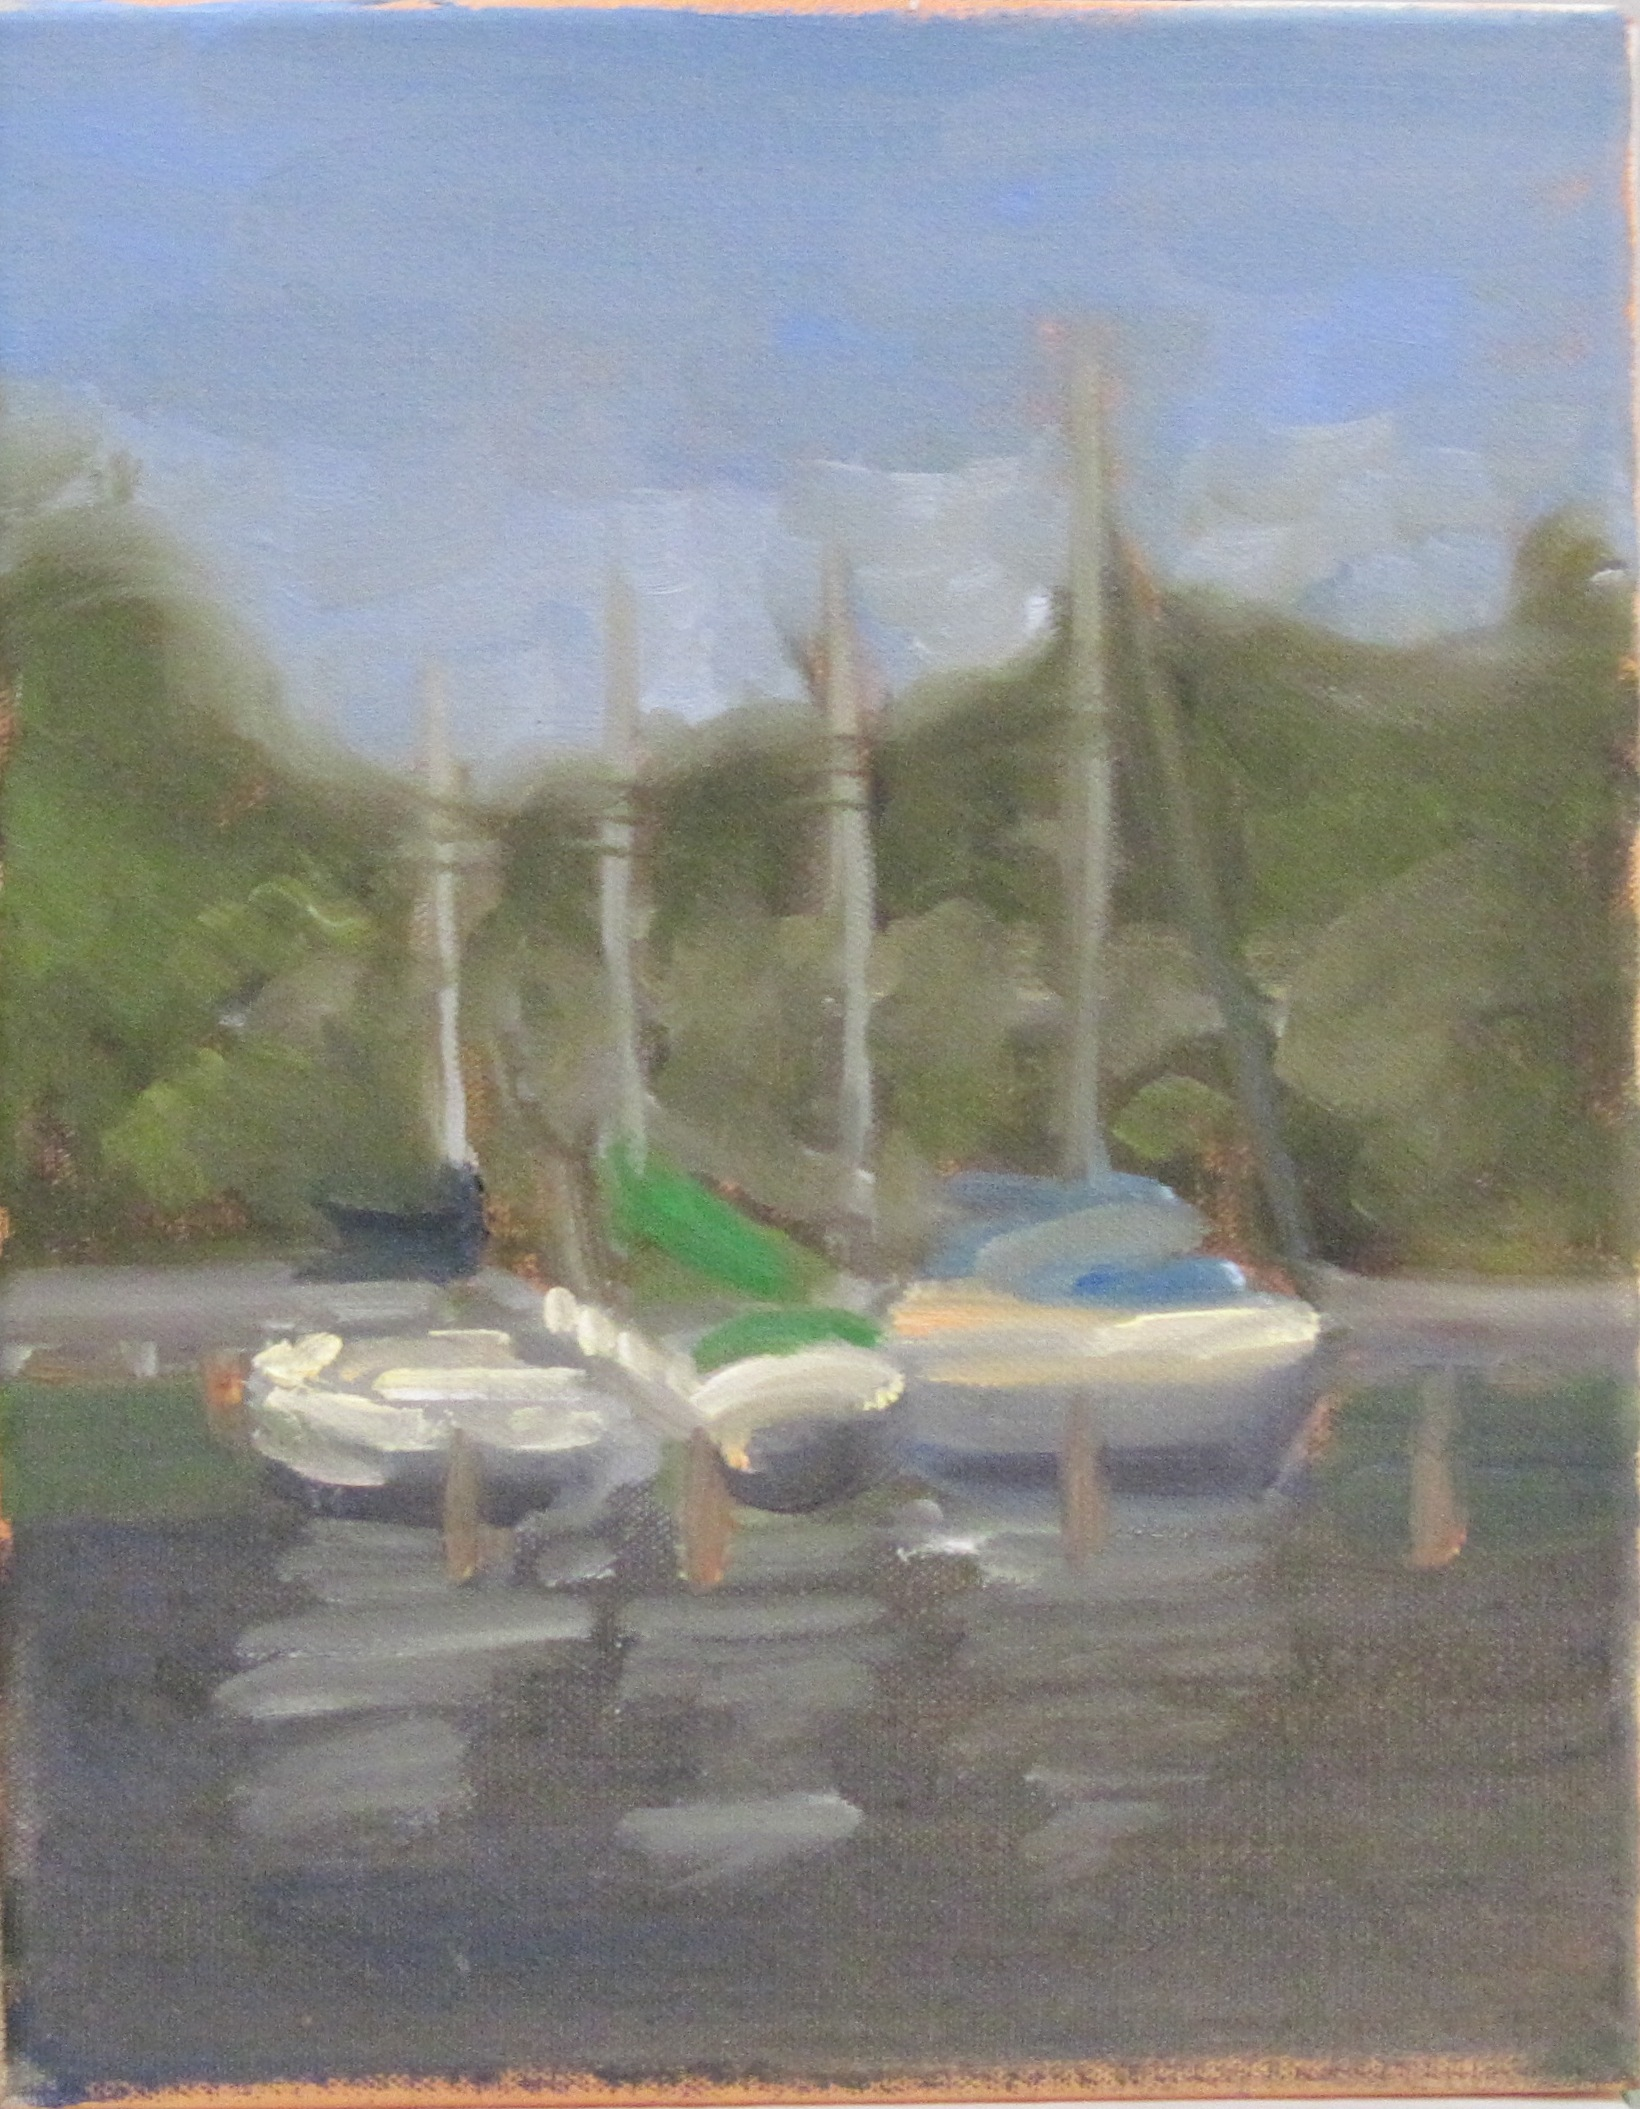 Sailboats on Solomon's Island, MD - study